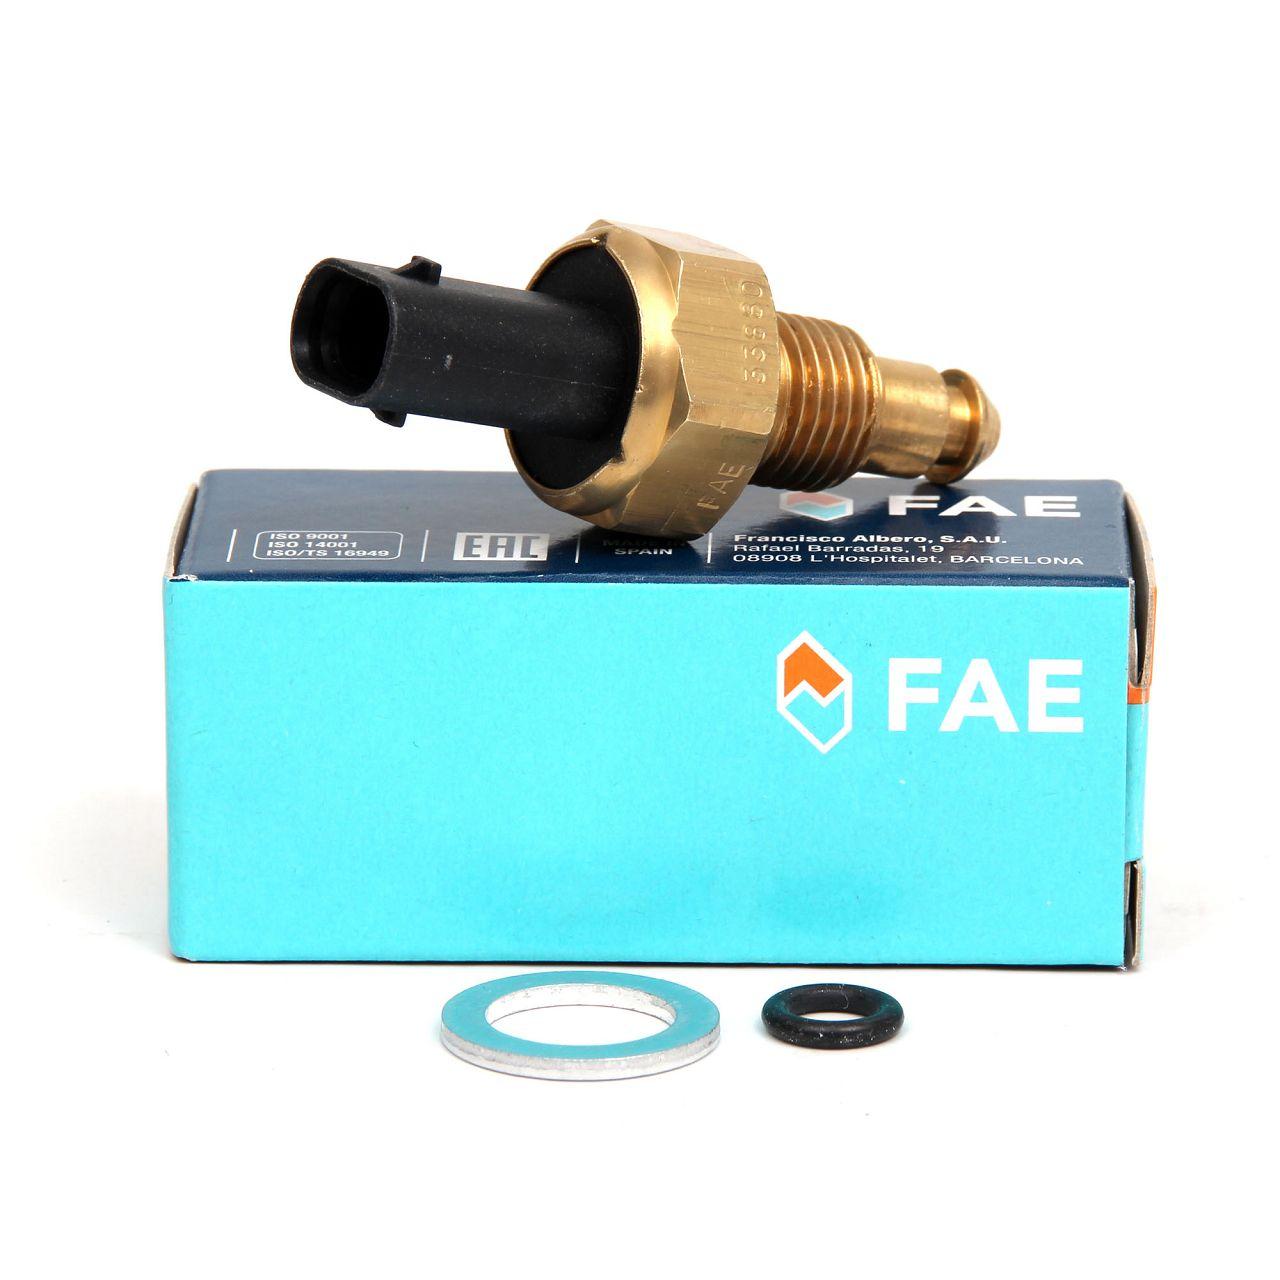 FAE Temperaturgeber Sensor Kraftstofftemperatur 33880 für KIA MERCEDES-BENZ